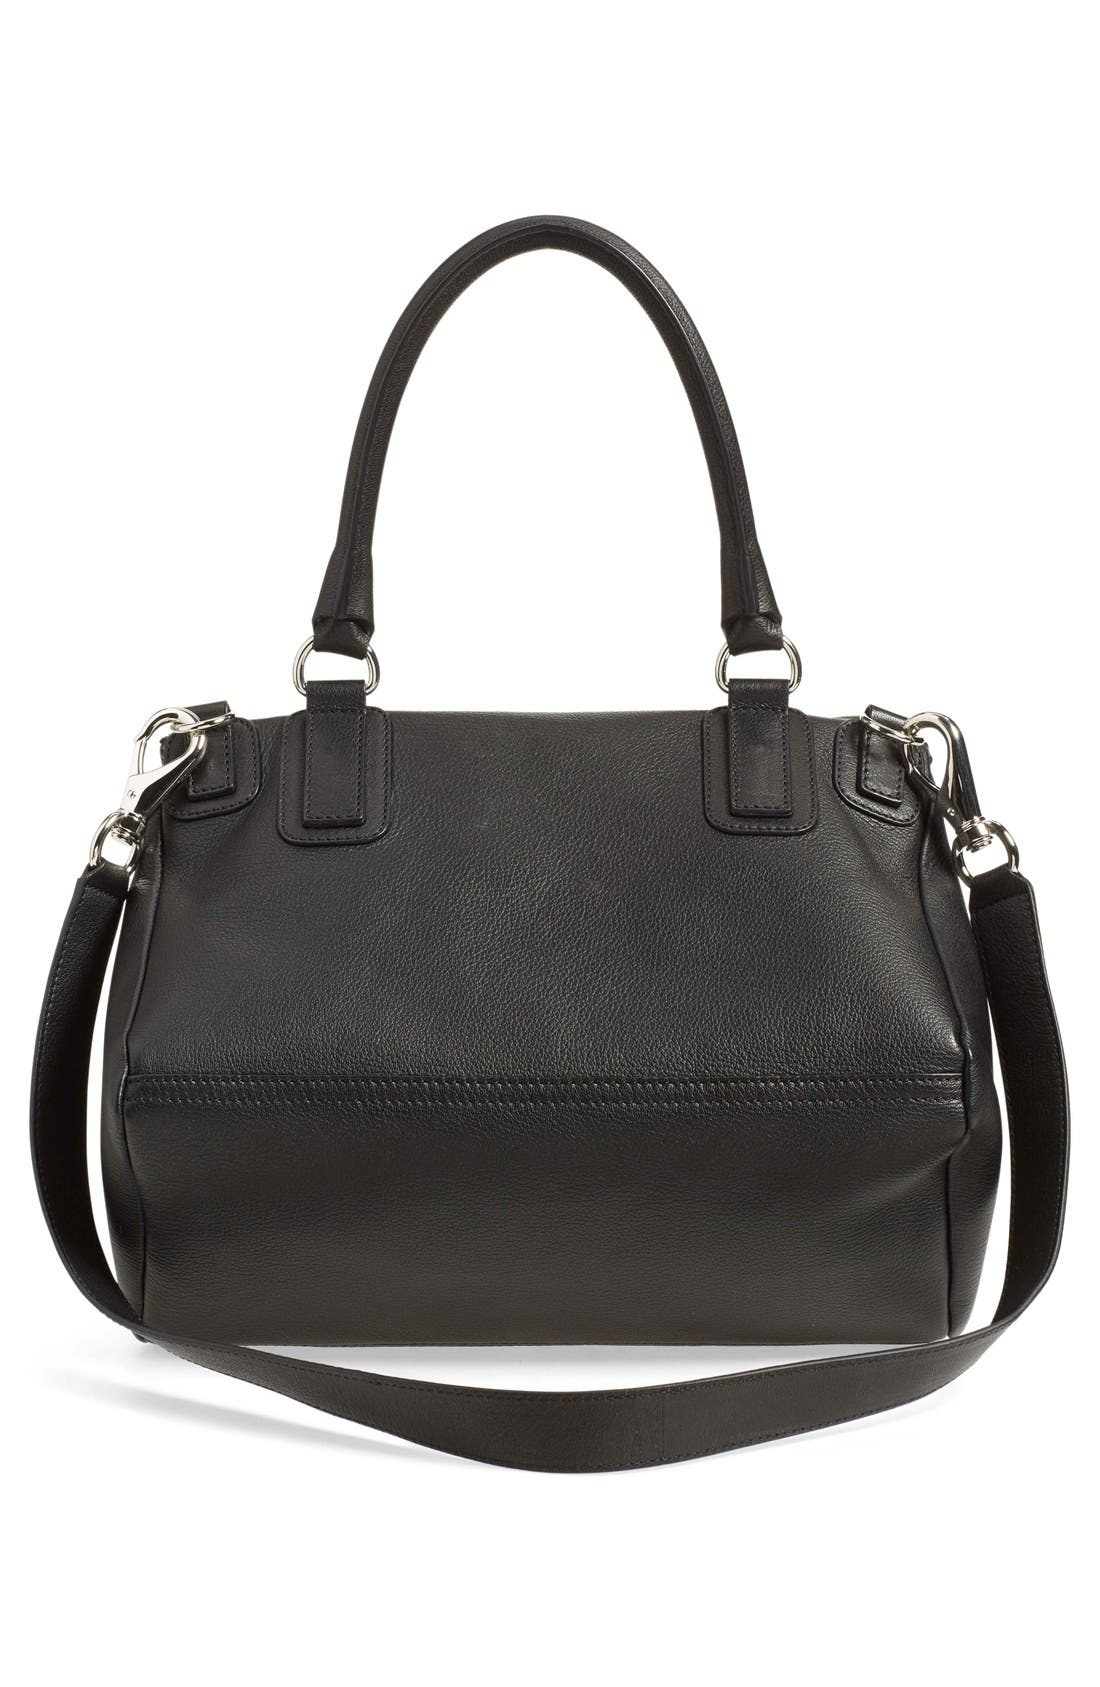 'Medium Pandora' Sugar Leather Satchel,                             Alternate thumbnail 3, color,                             Black